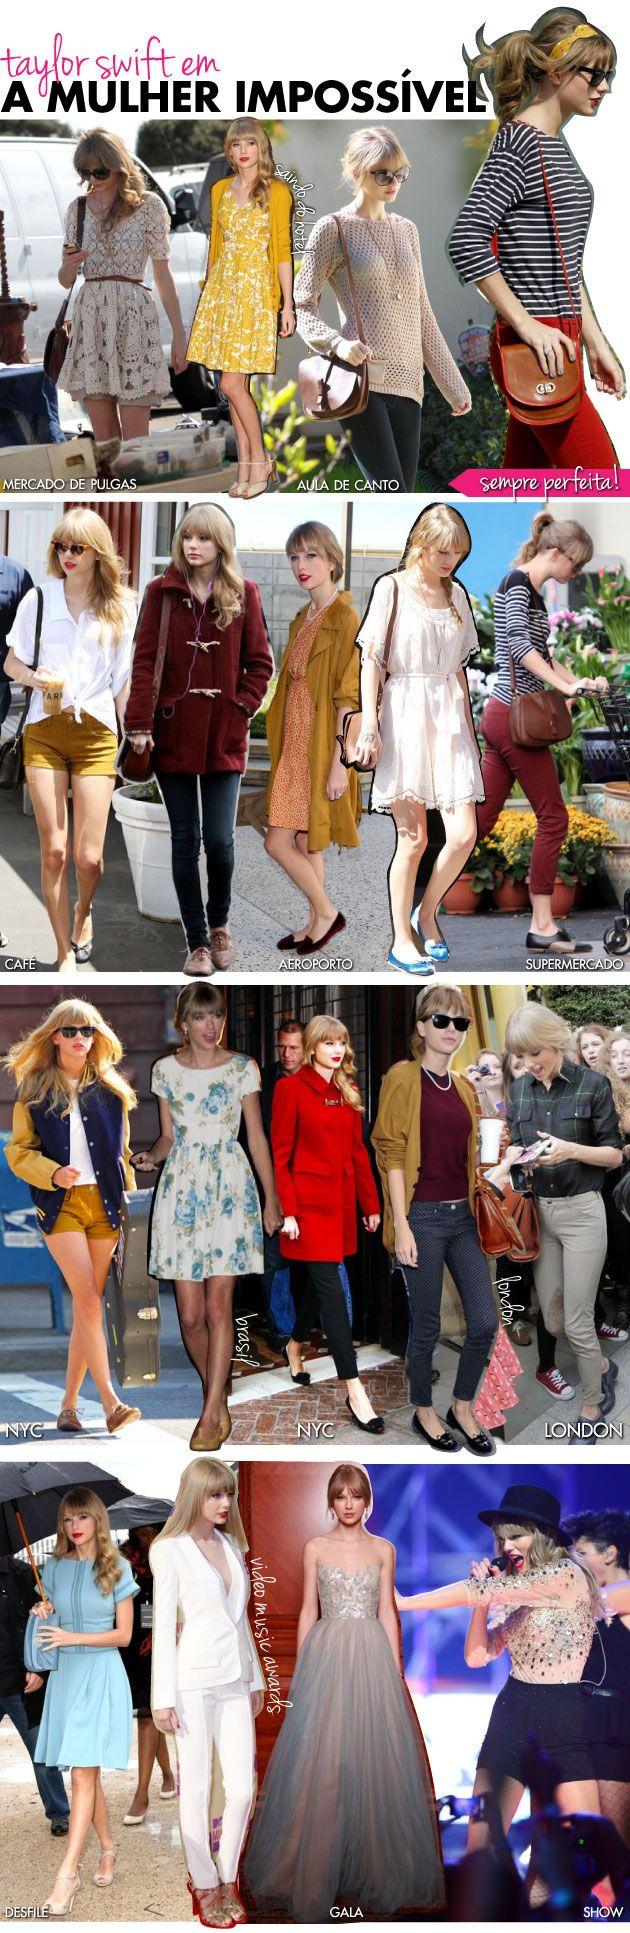 taylor-swift-mulher-impossivel-perfeita-street-style-looks-estilo-dia-a-dia-retro-cabelo-make